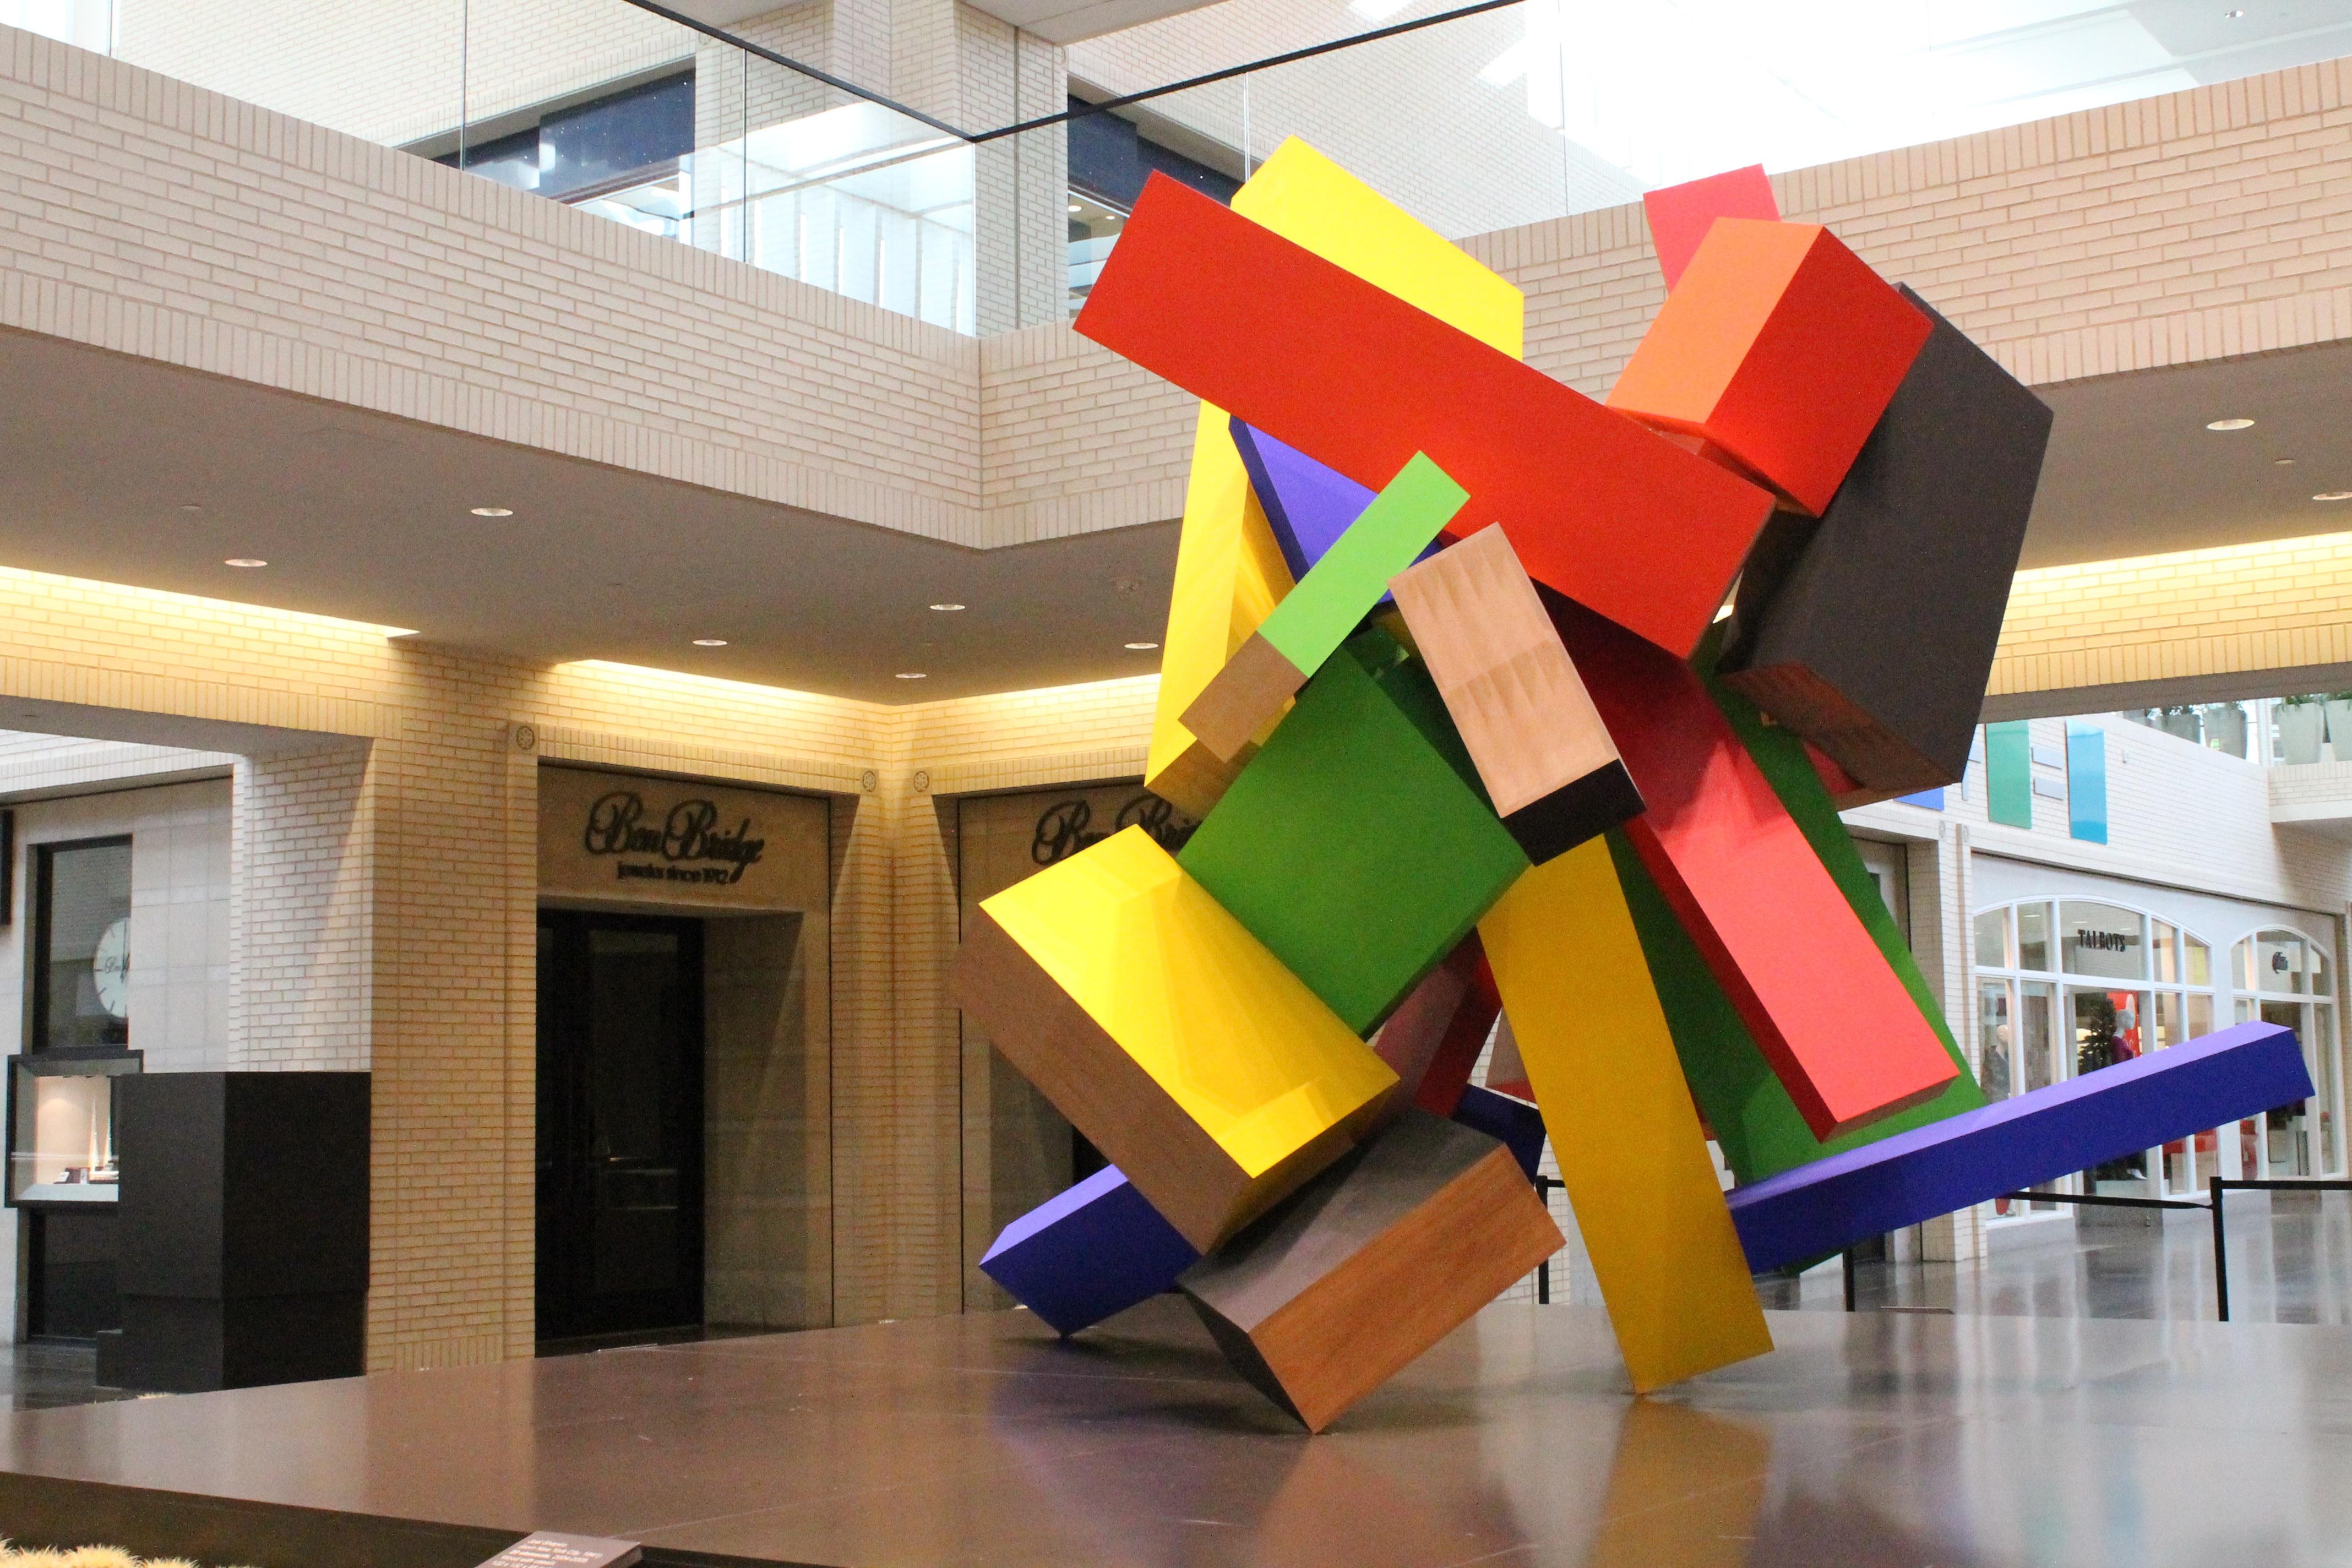 Fotos gratis estructura madera geometr a color - Diseno de interiores gratis ...